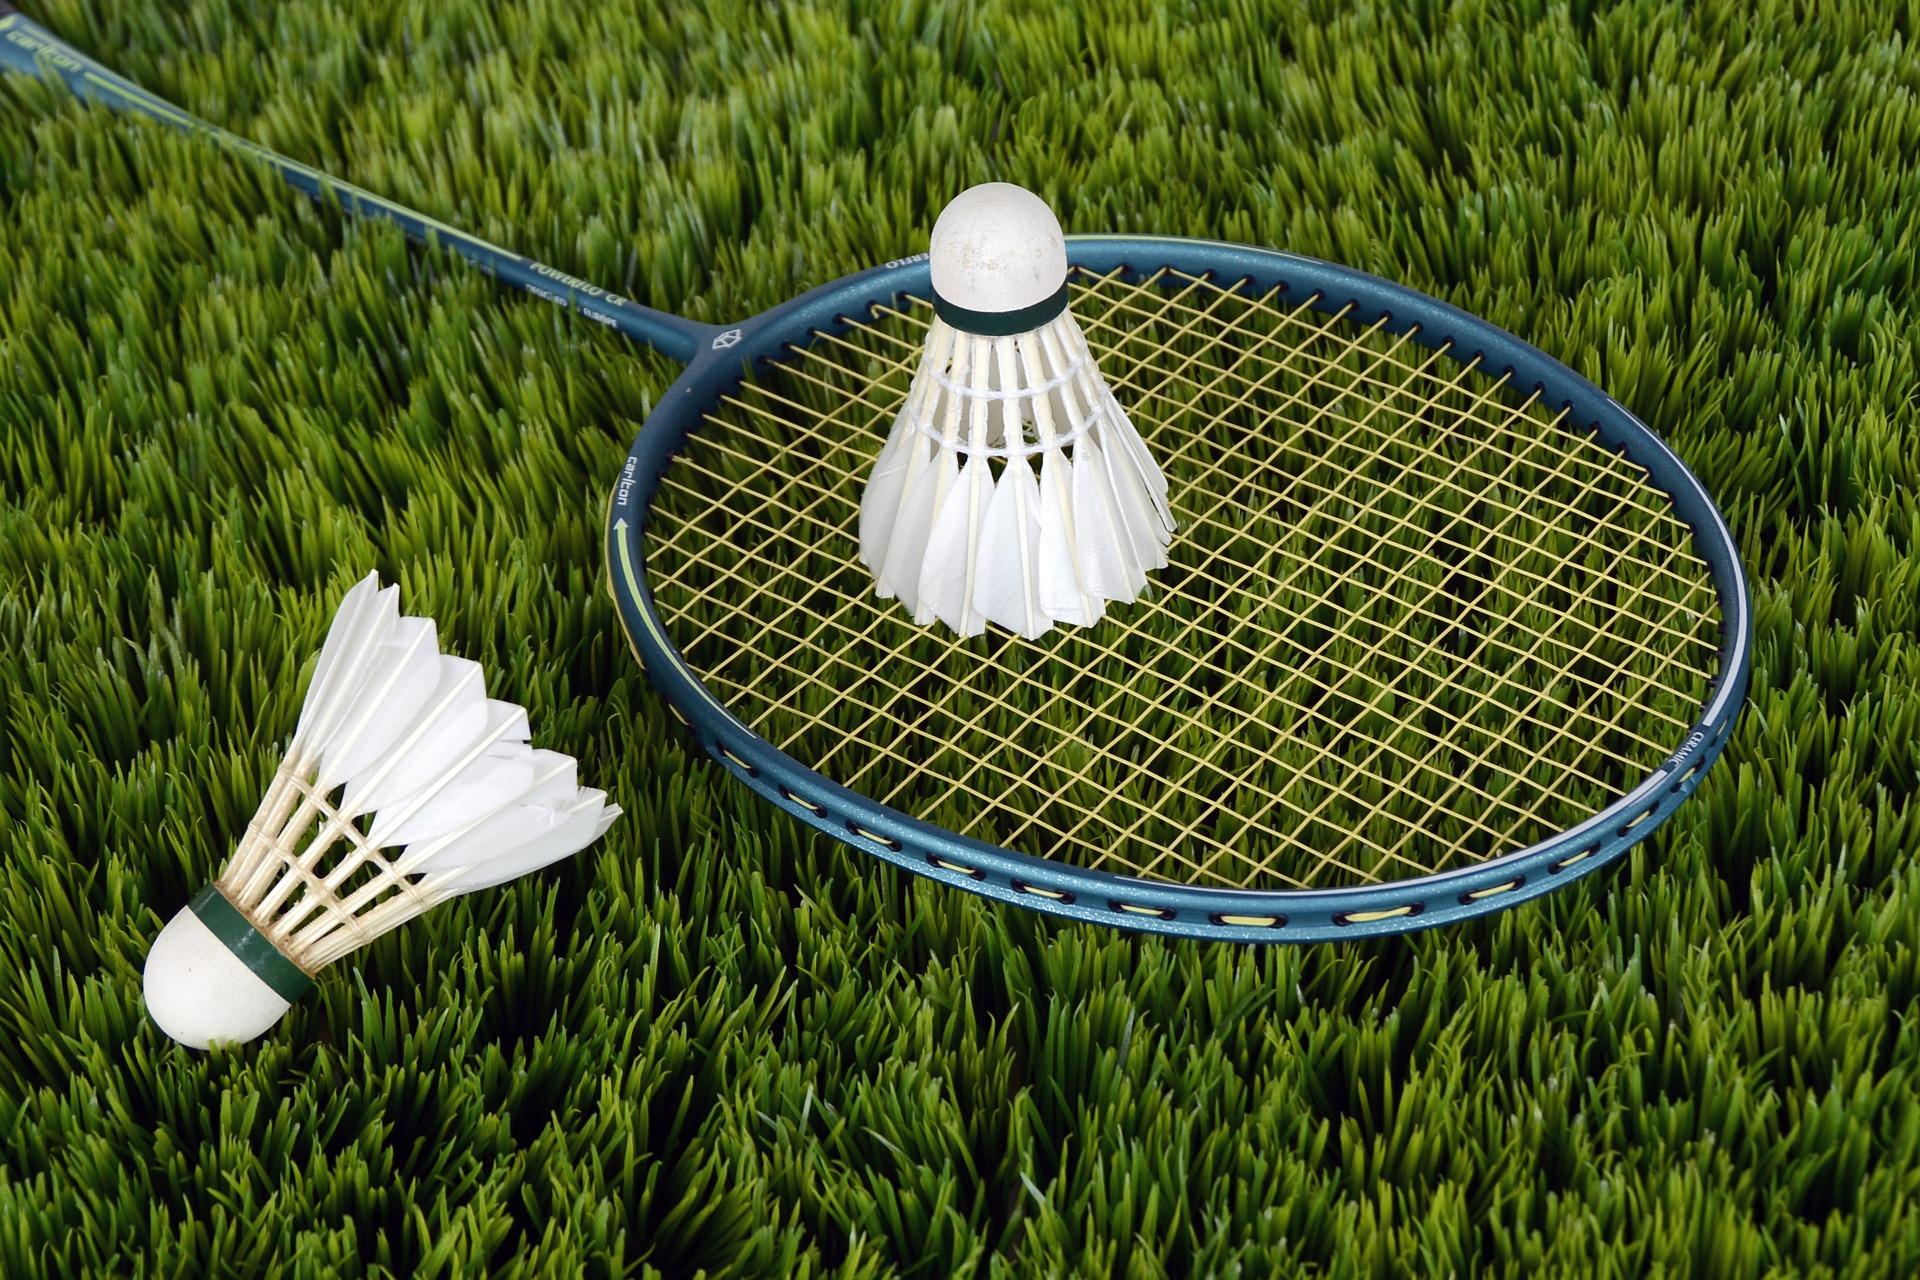 meilleur sac badminton